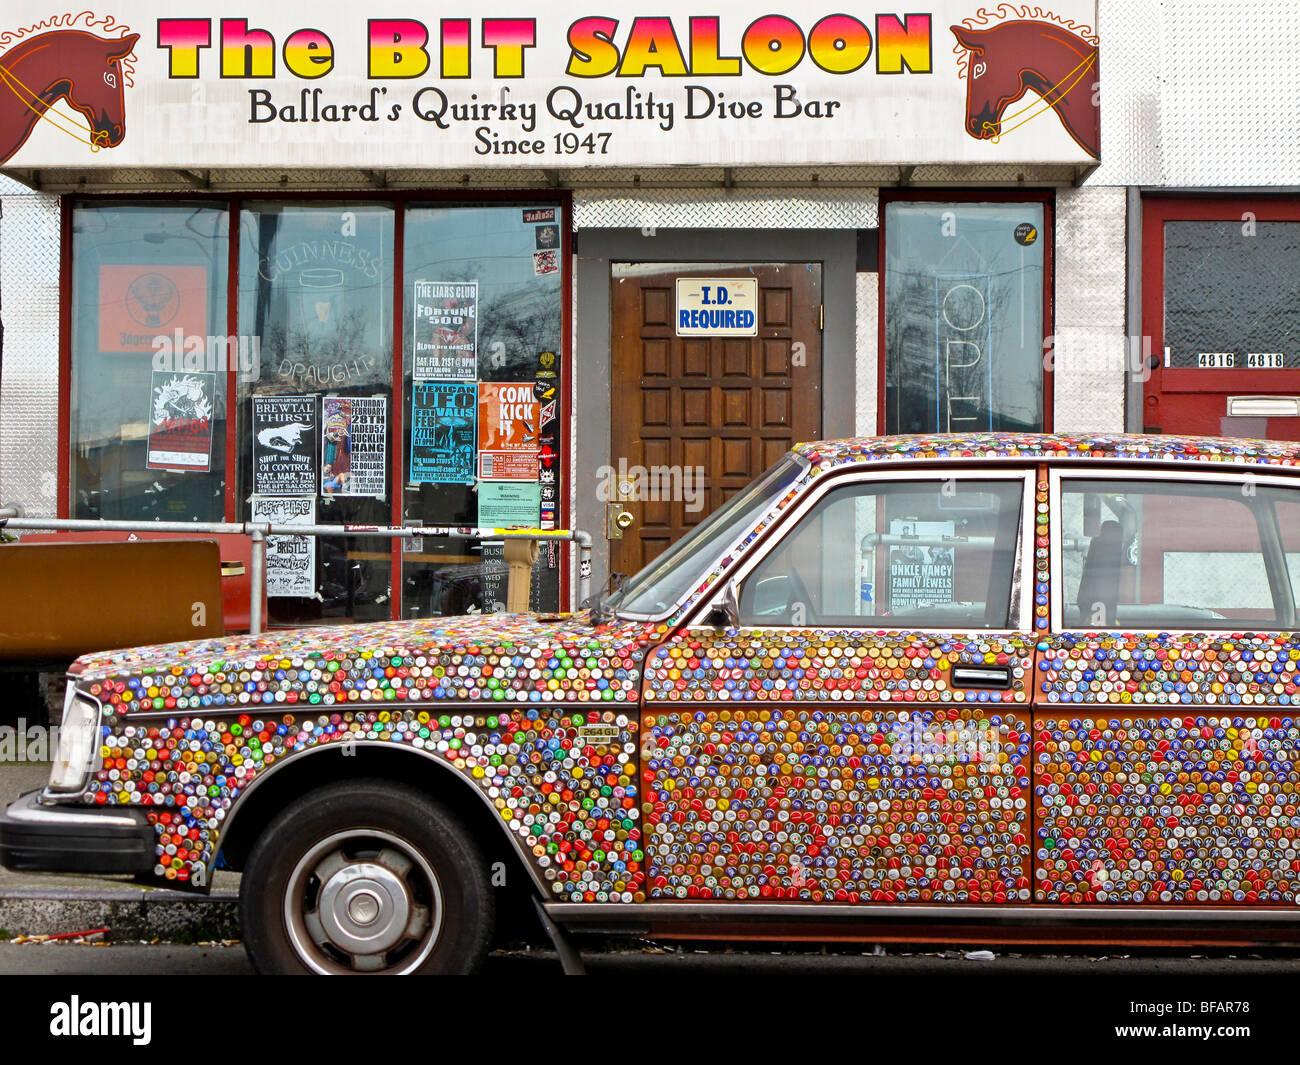 Volvo sedán todo decorado con tapas de botella, poco Saloon en Ballard, Seattle, Washington Imagen De Stock